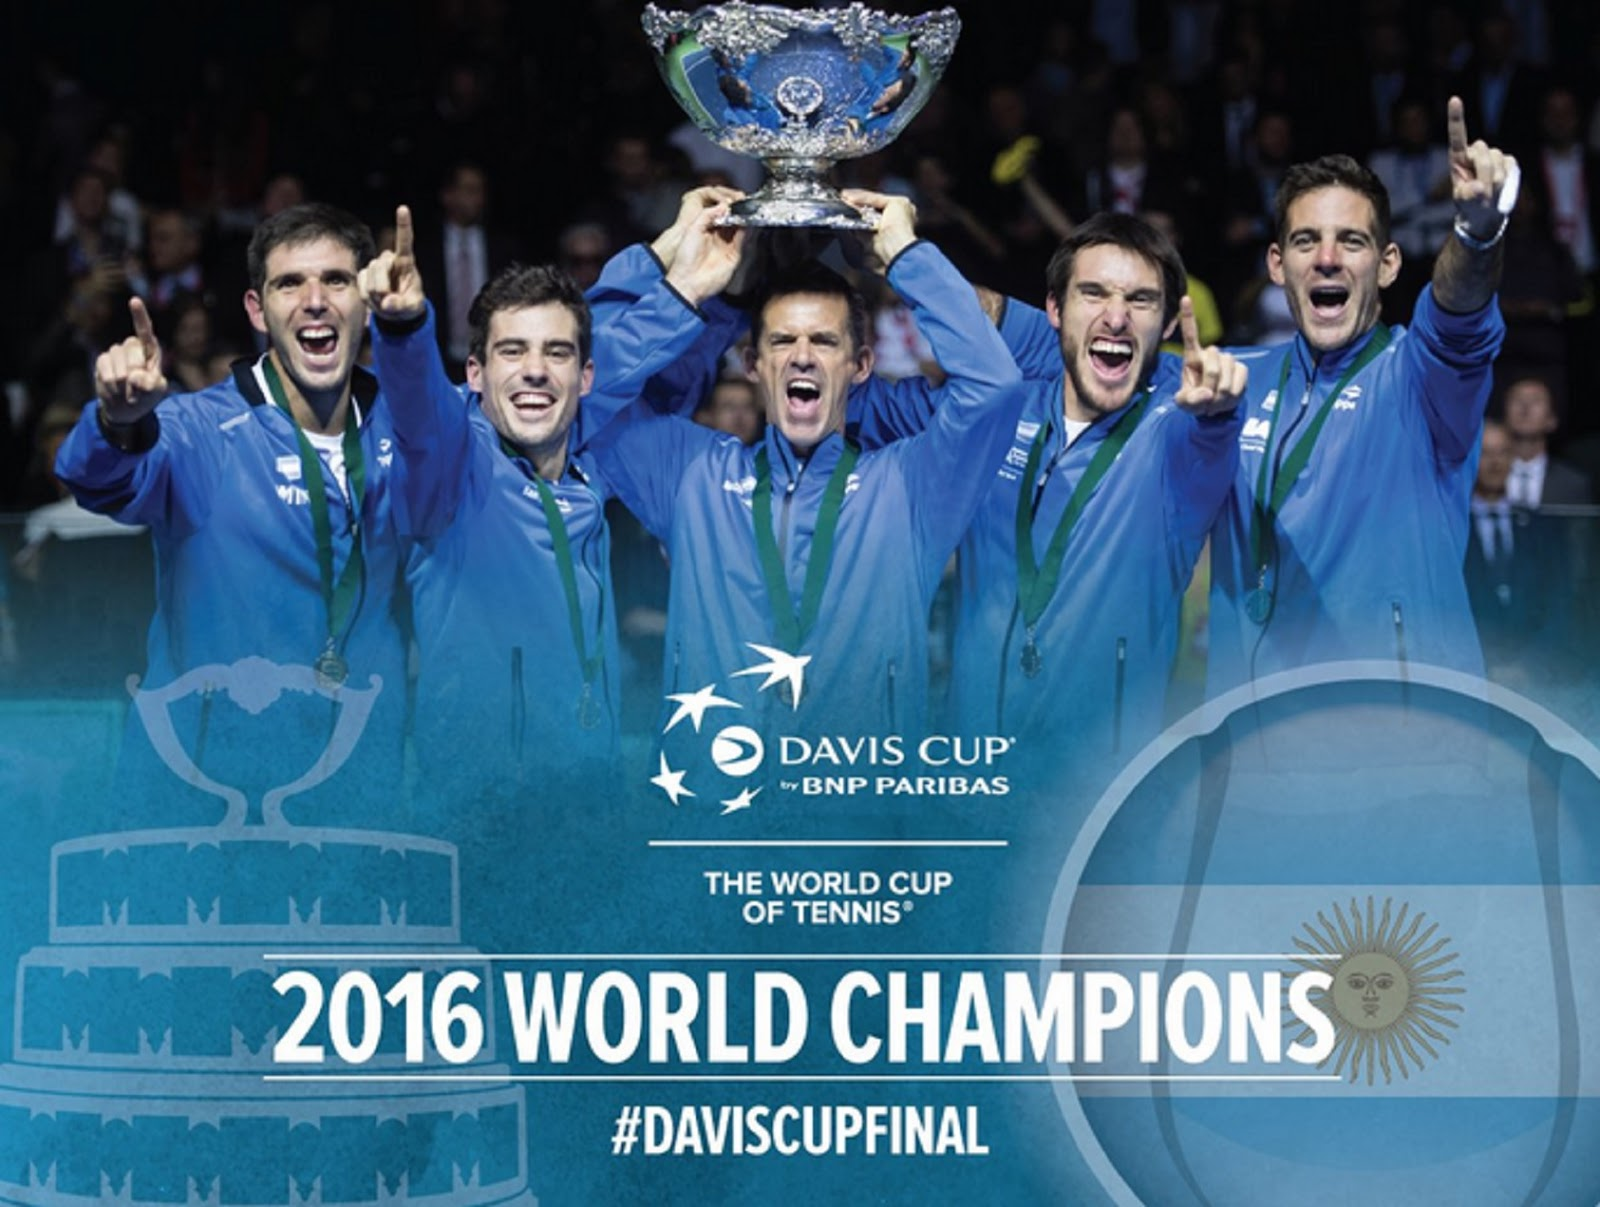 ARGENTINA DAVIS CUP CHAMPIONS